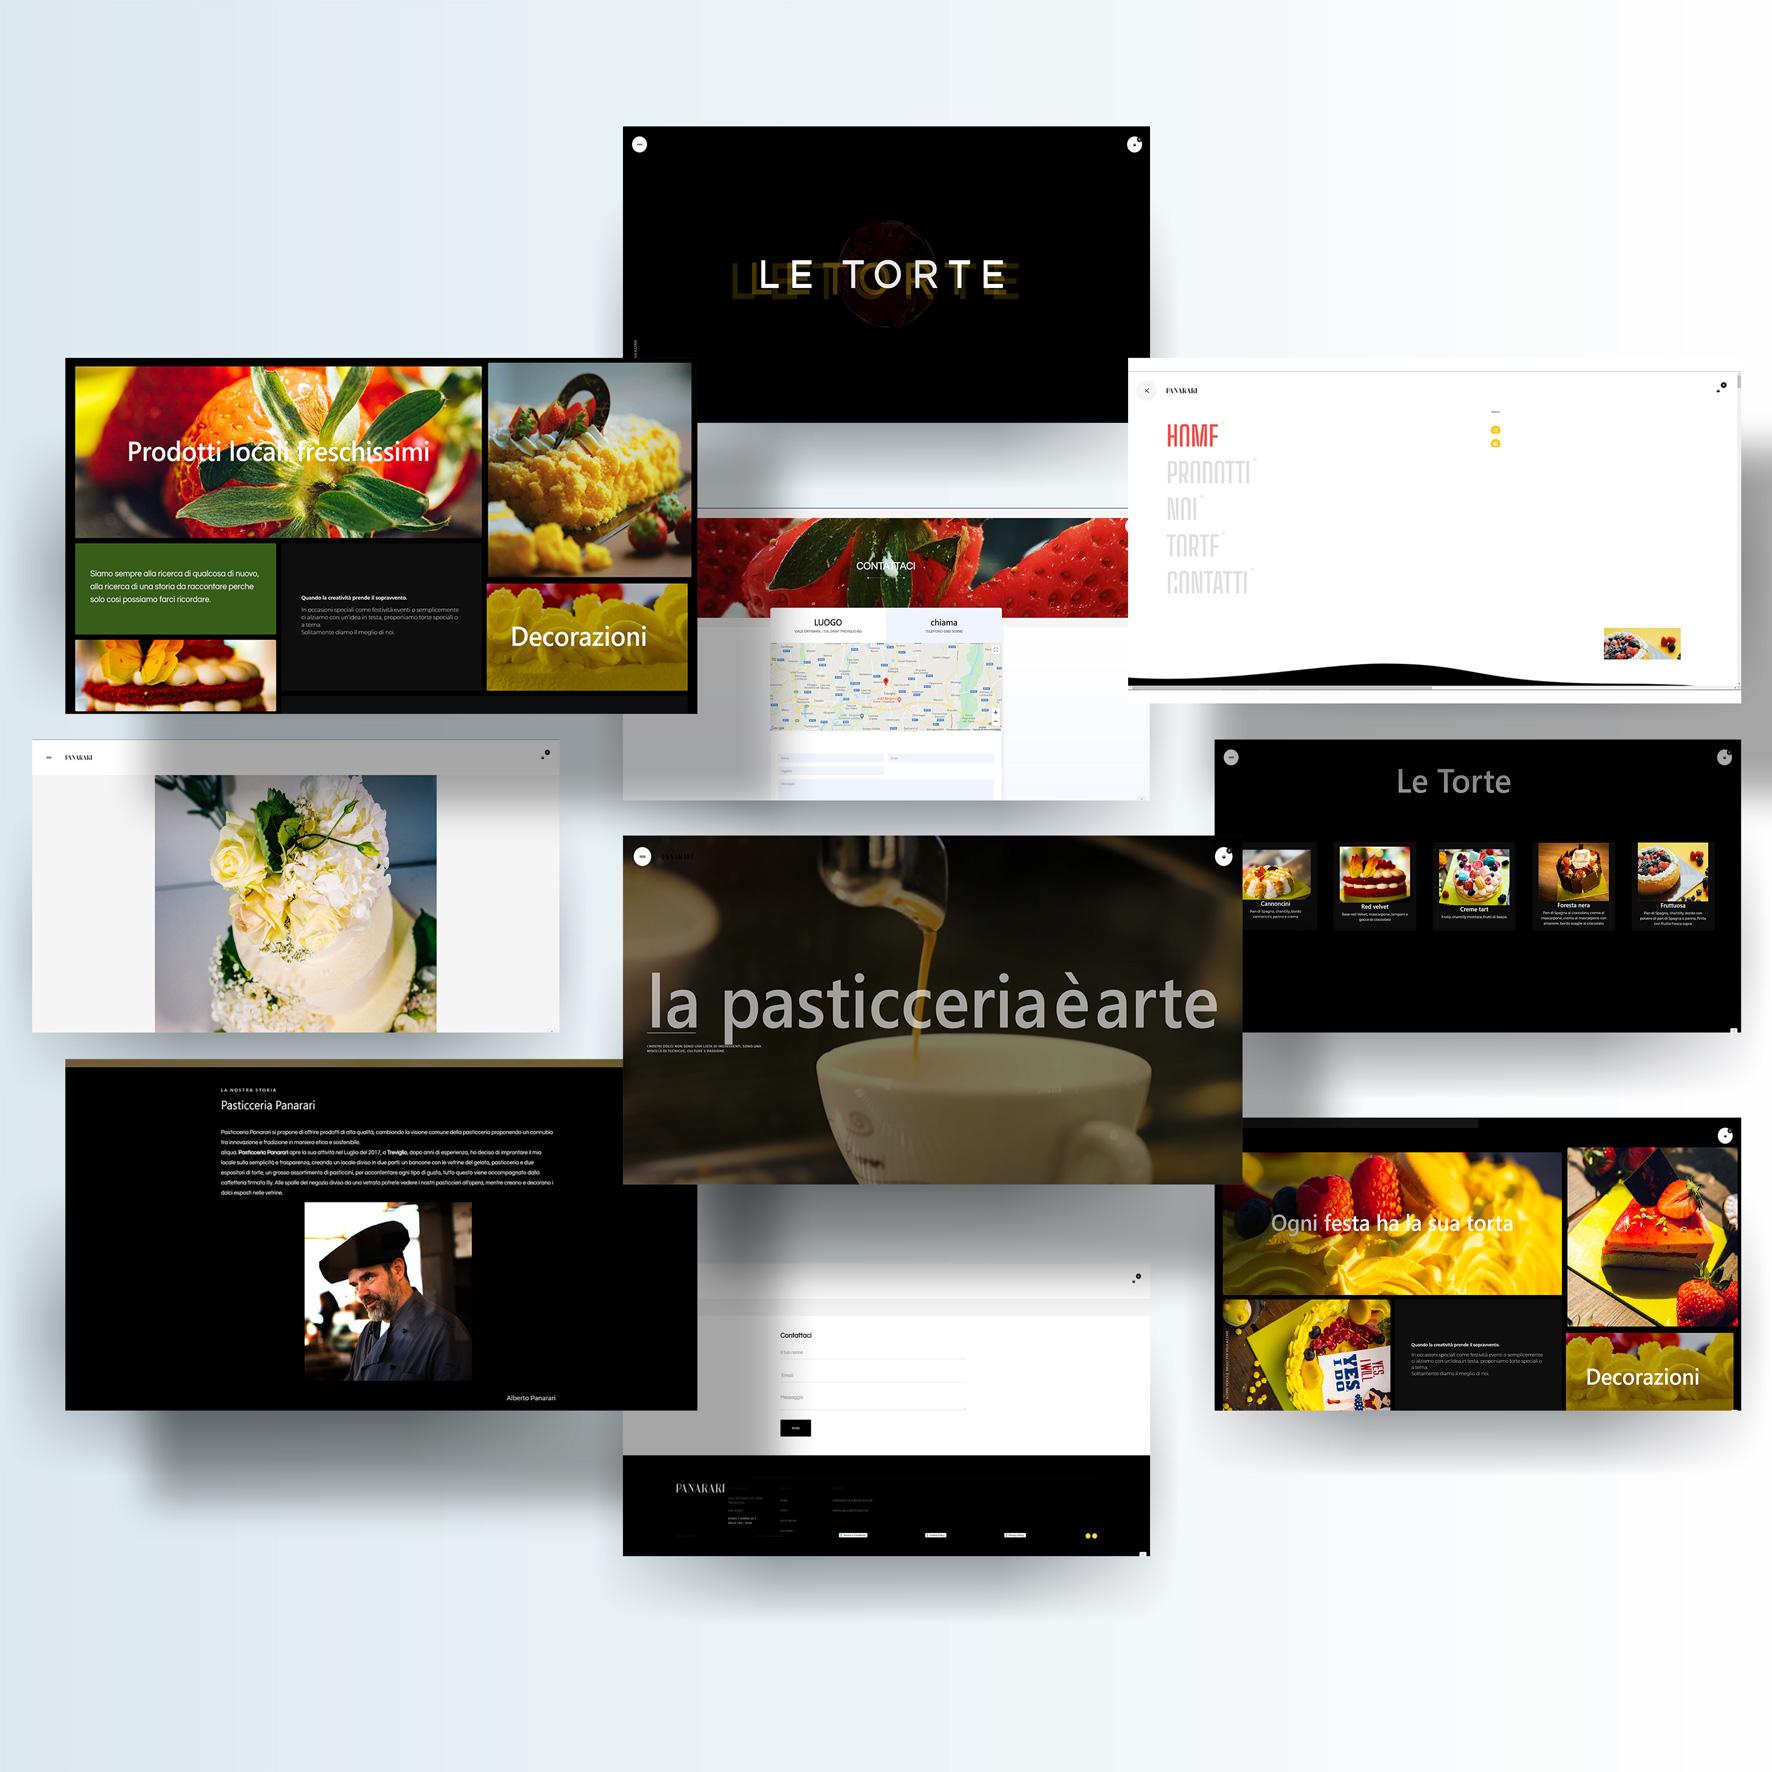 Alberto Quistini, Web design, Pasticceria Panarari